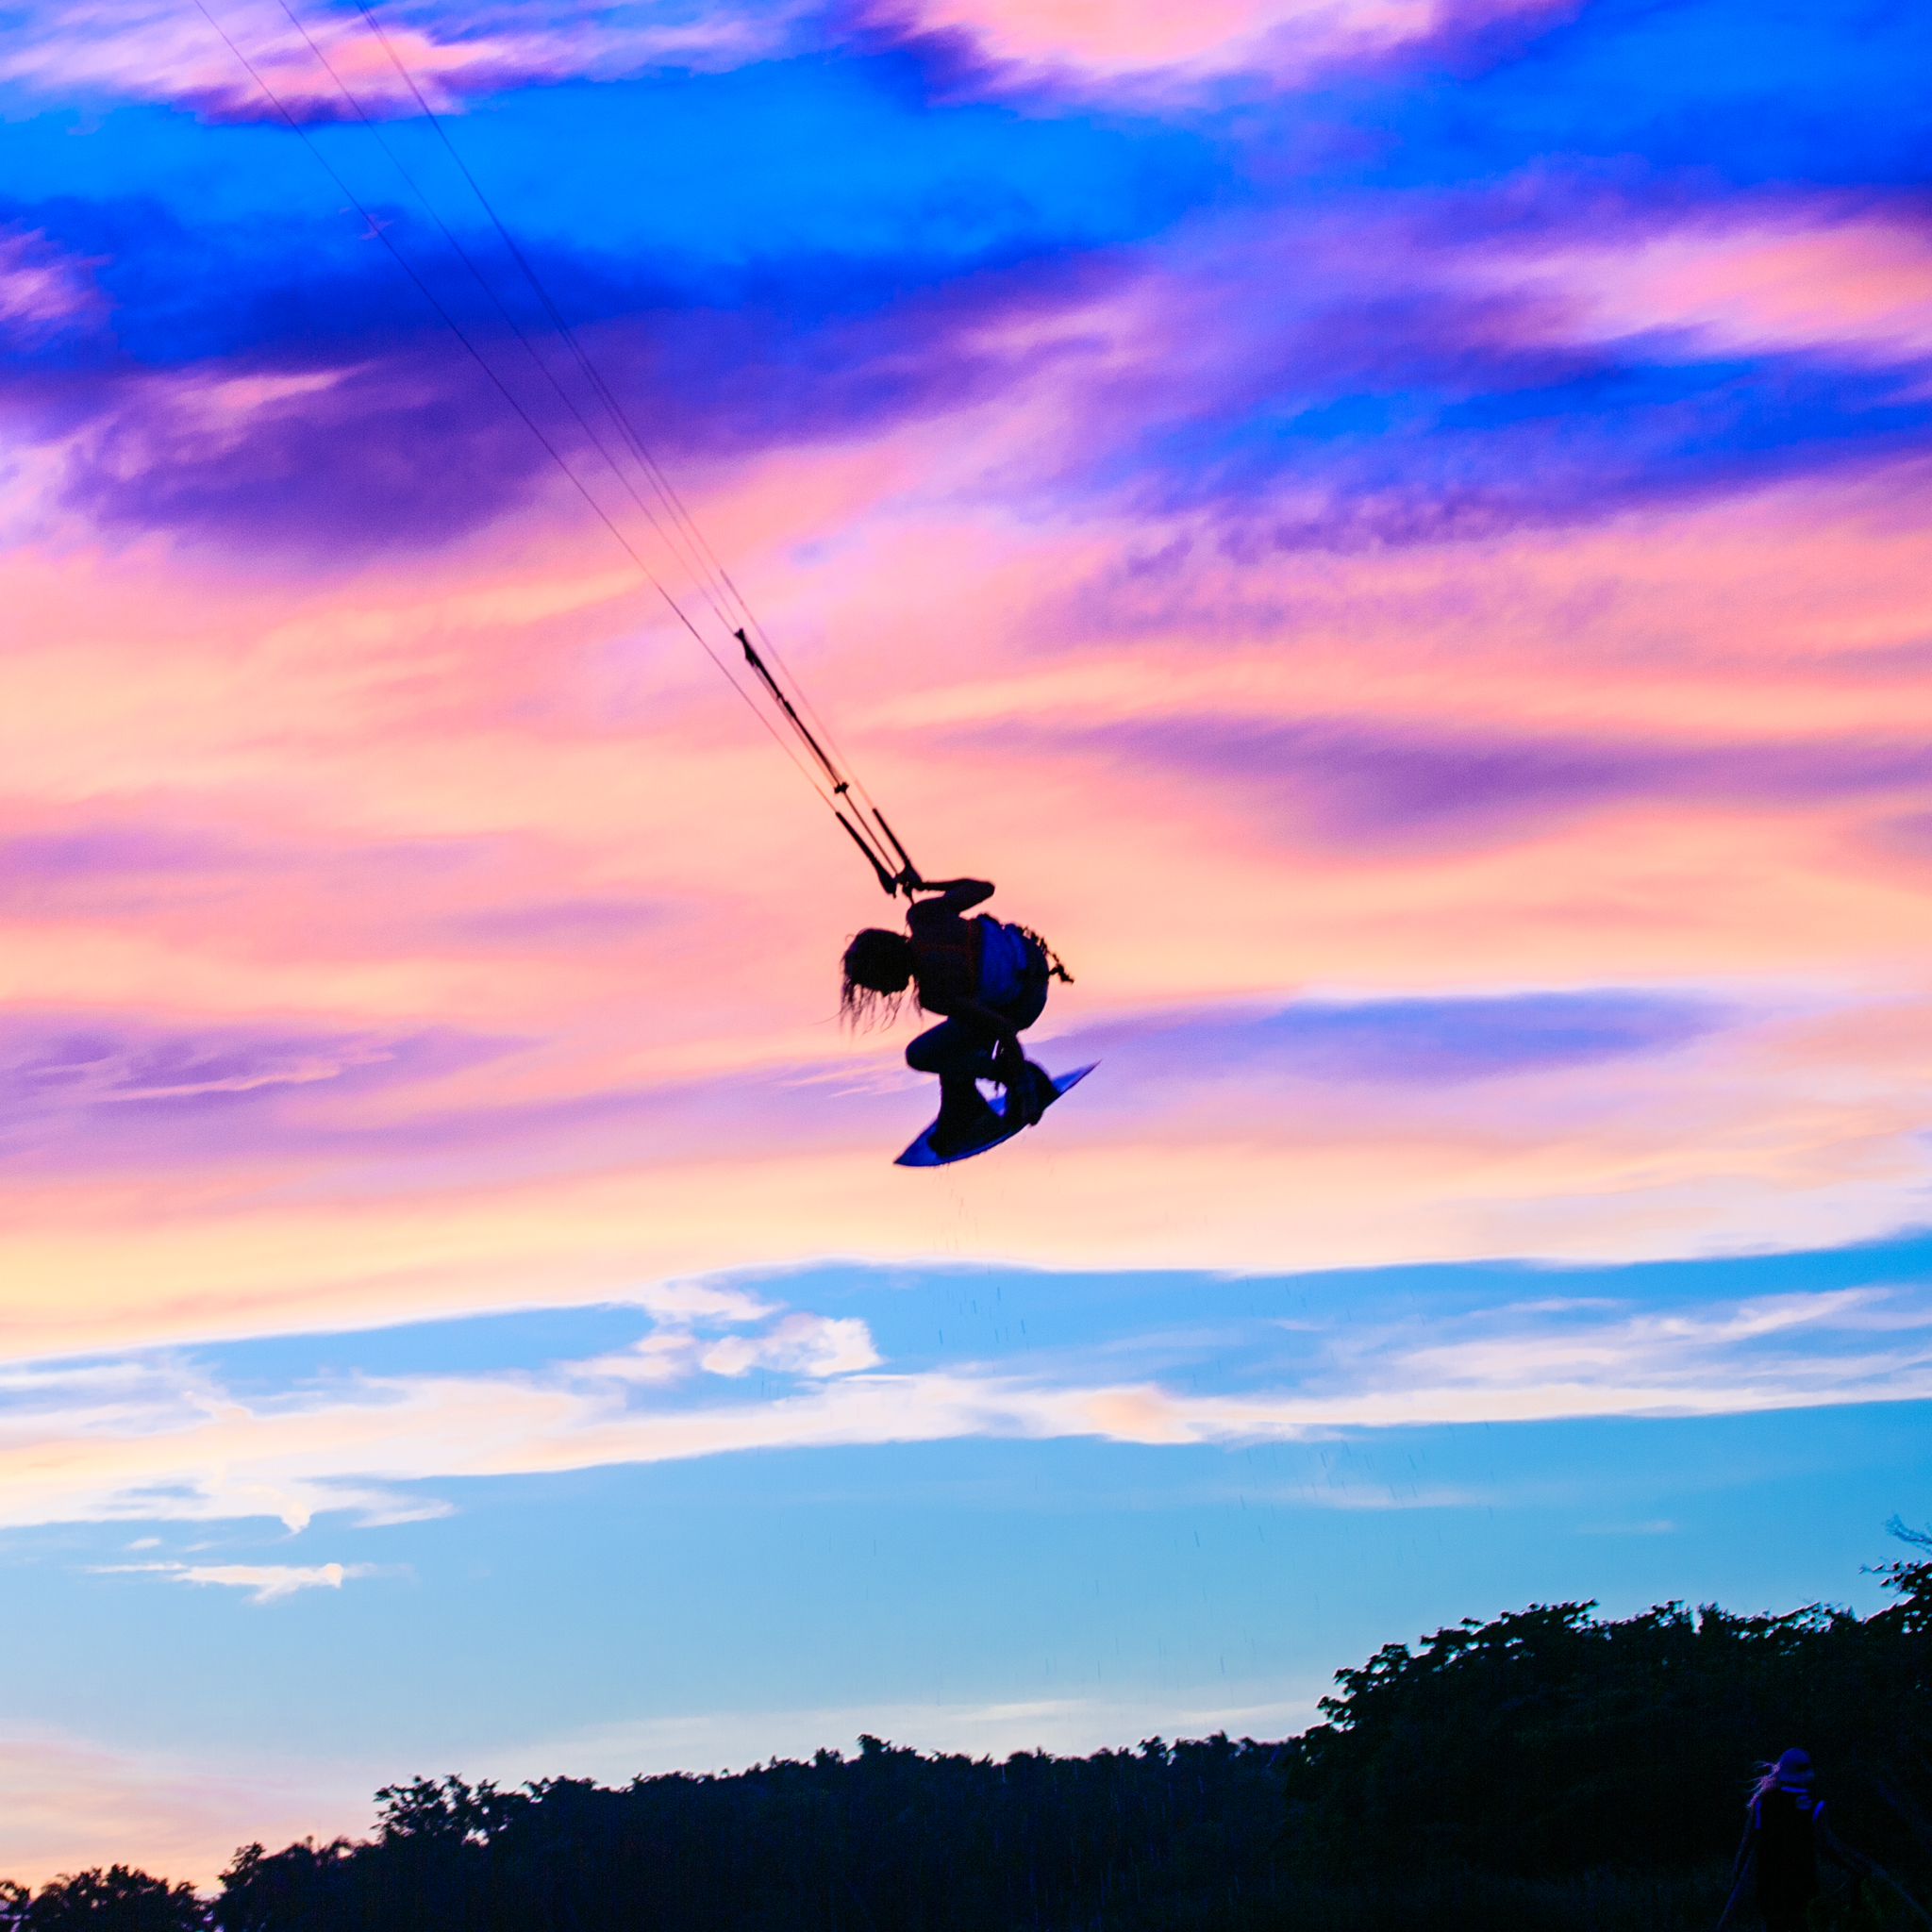 kitesurf wallpaper image - Indie grab at sunset with Tona Boards - kitesurfing - in resolution: iPad 2 & 3 2048 X 2048